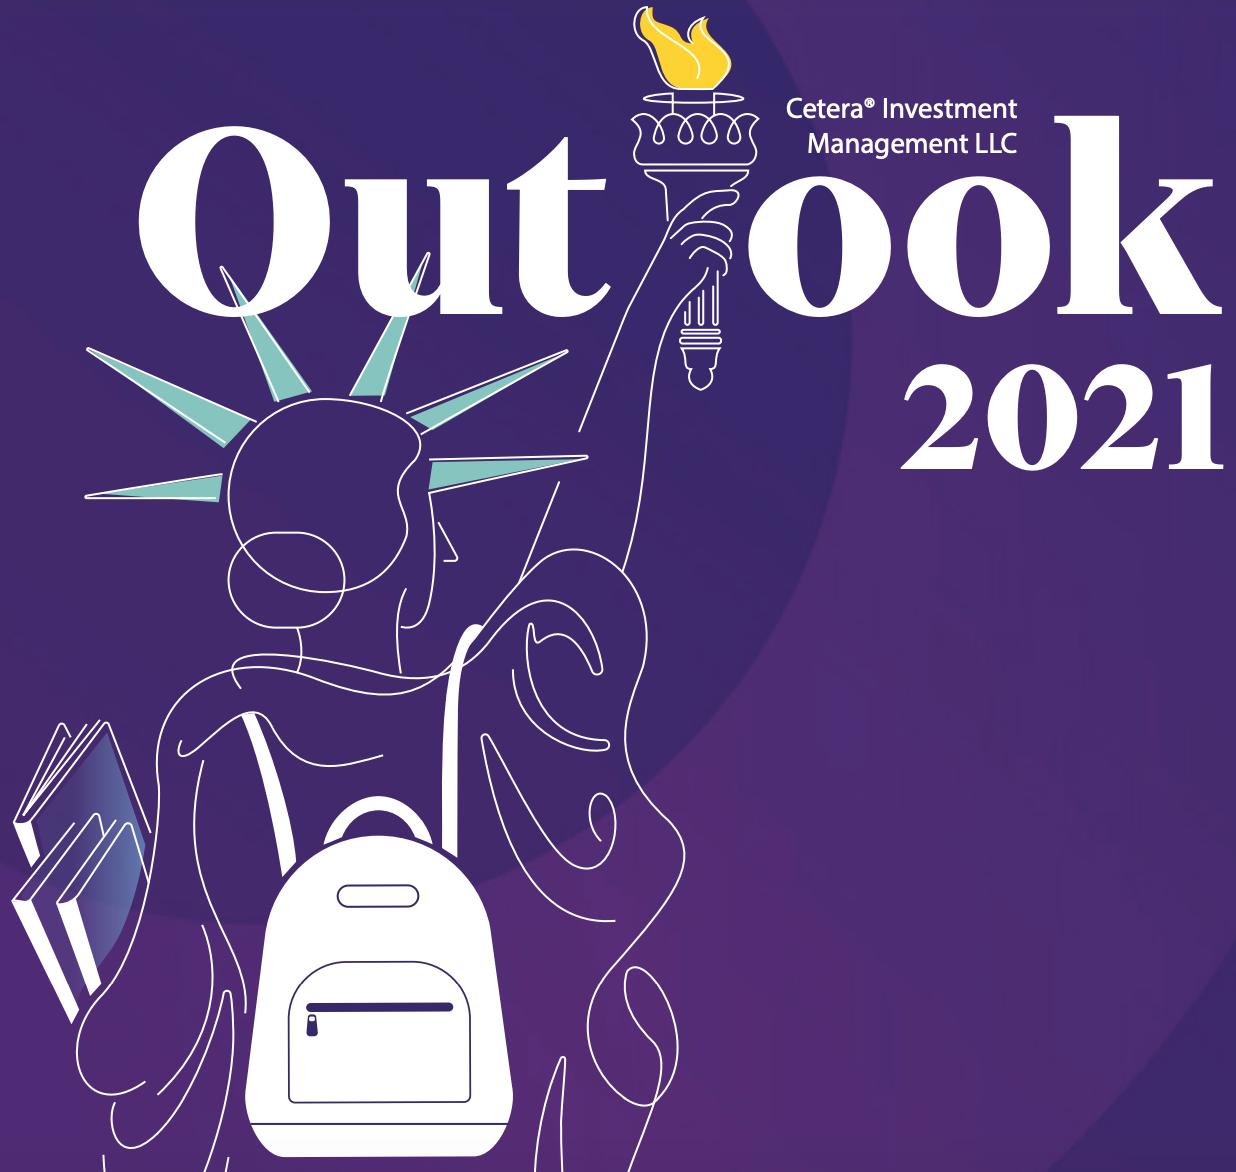 2021 Market Outlook - Cetera Investment Management Thumbnail